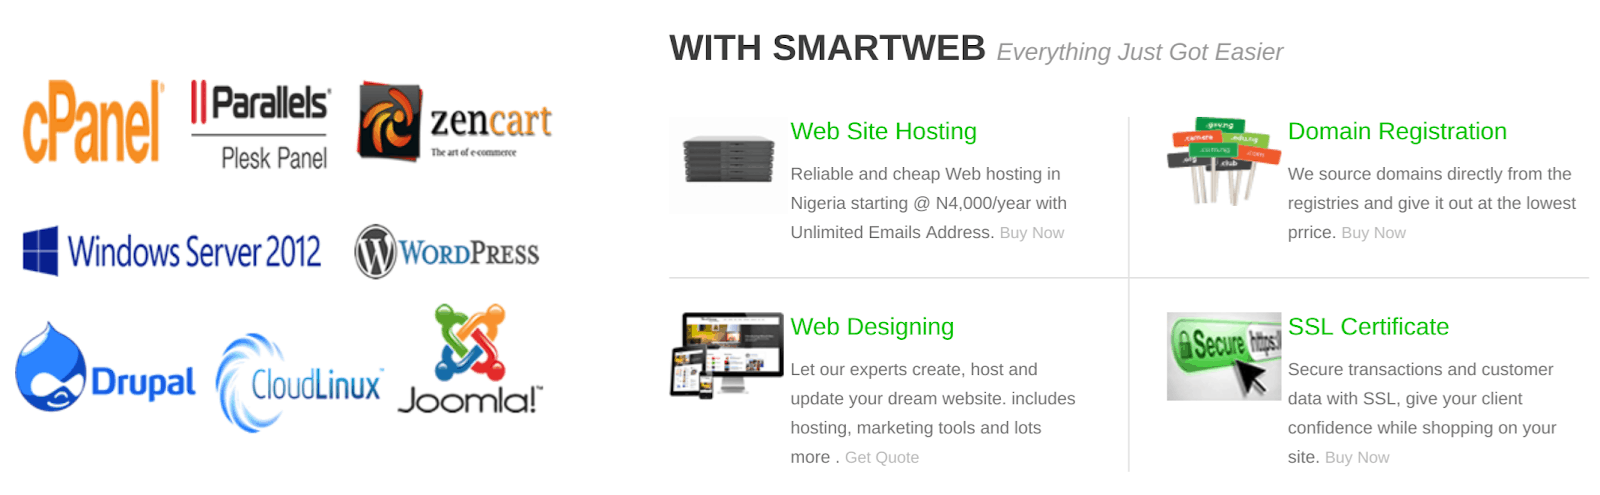 smartwebnigeria 1